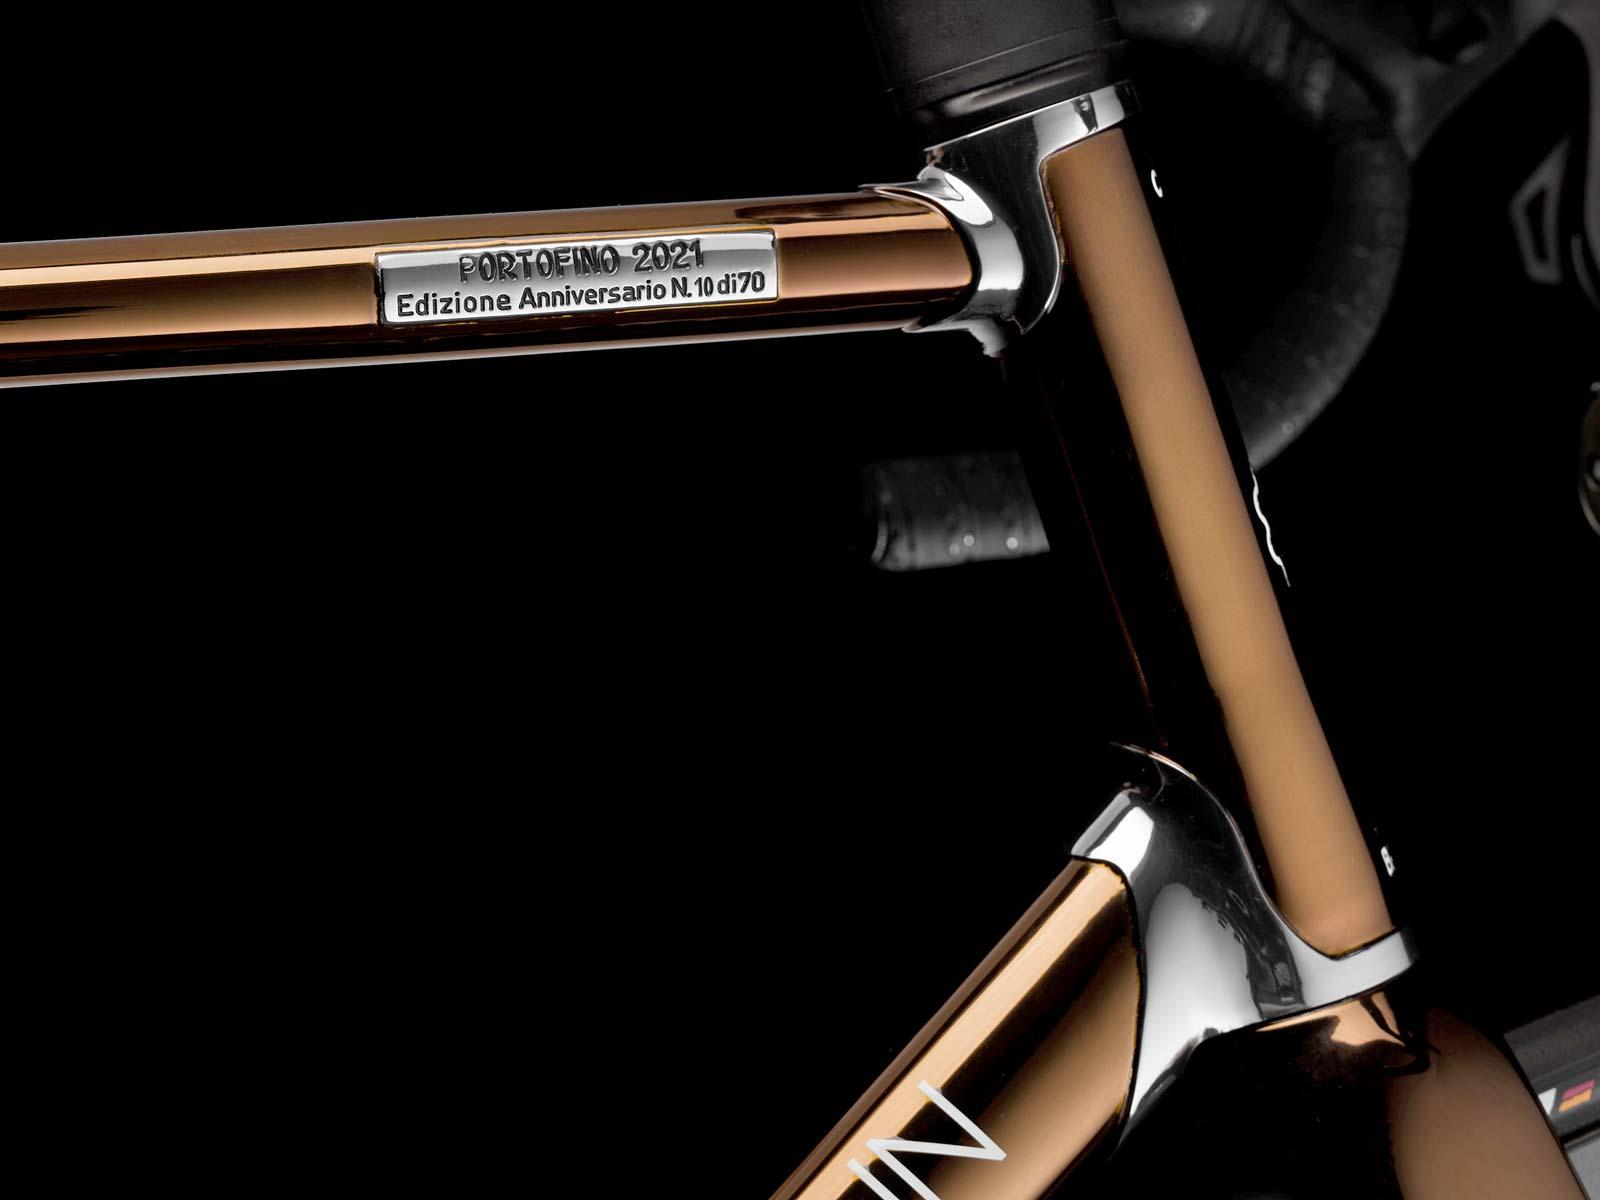 2021 Battaglin Portofino Edizione Anniversario road bike, handmade Italian modern lugged steel road bike with full internal routing,limited edition number plate